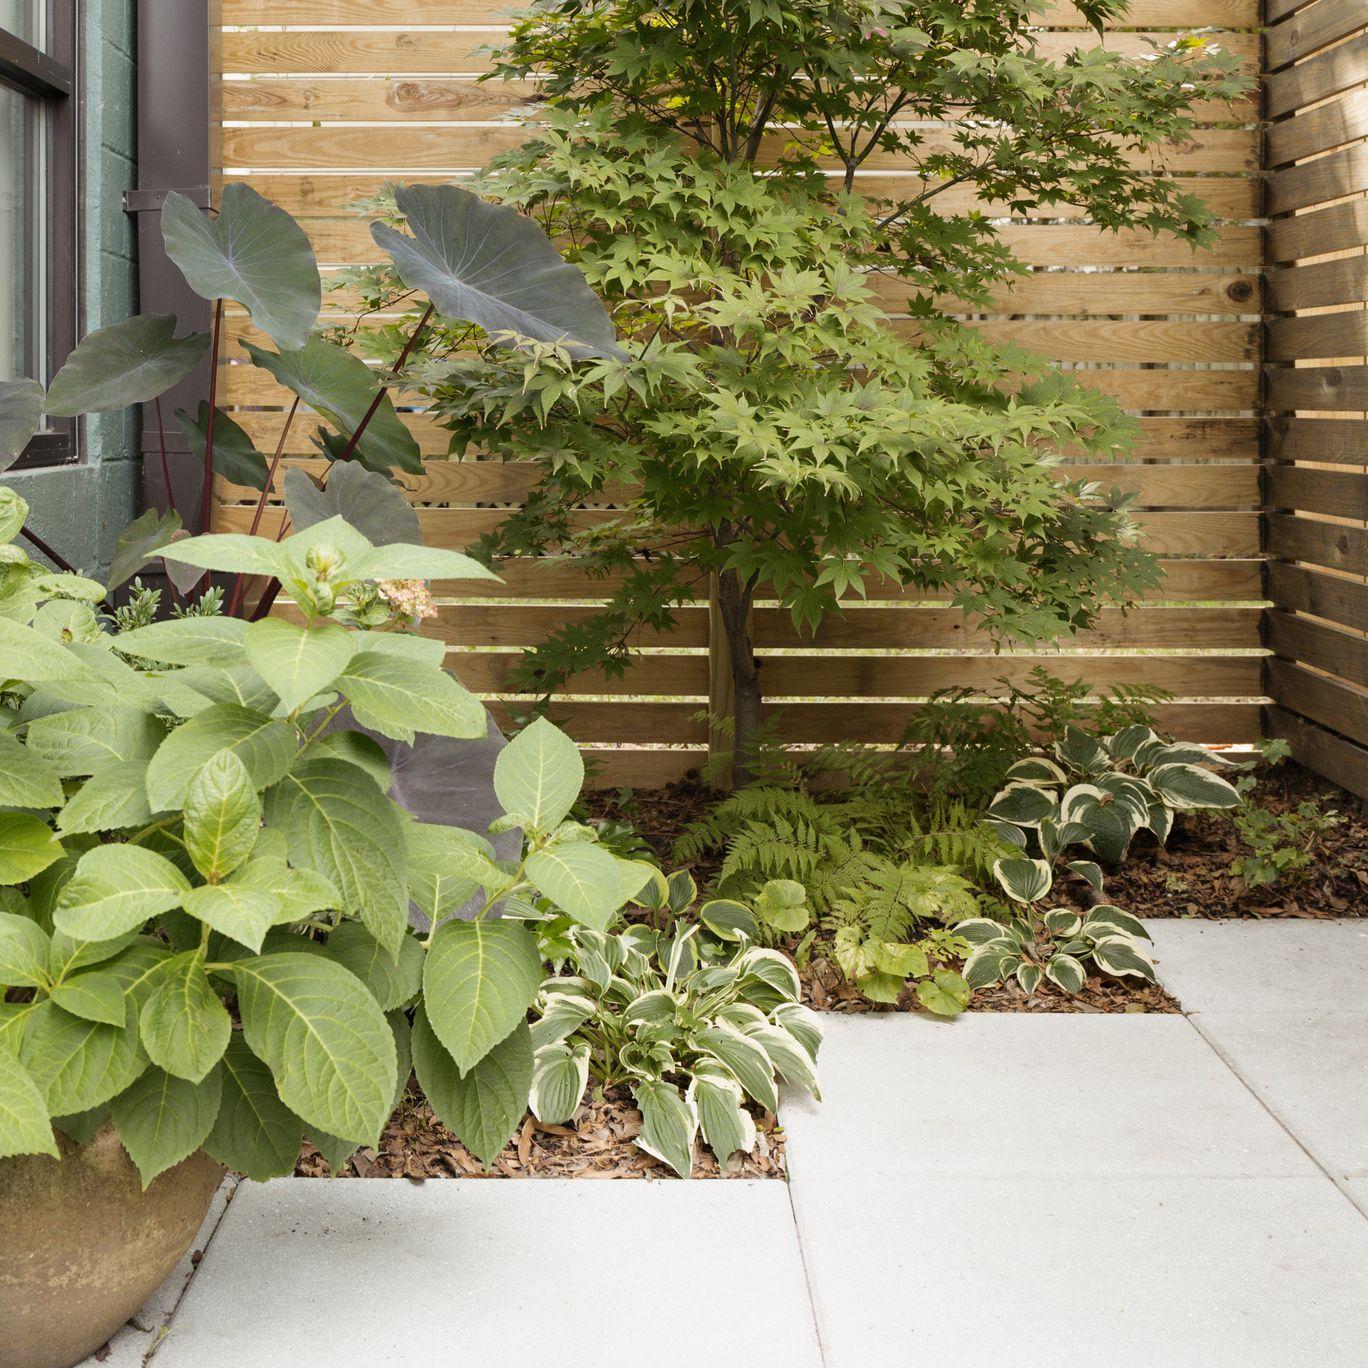 Tiered Contemporary Urban Garden: Минимальный уход за садом